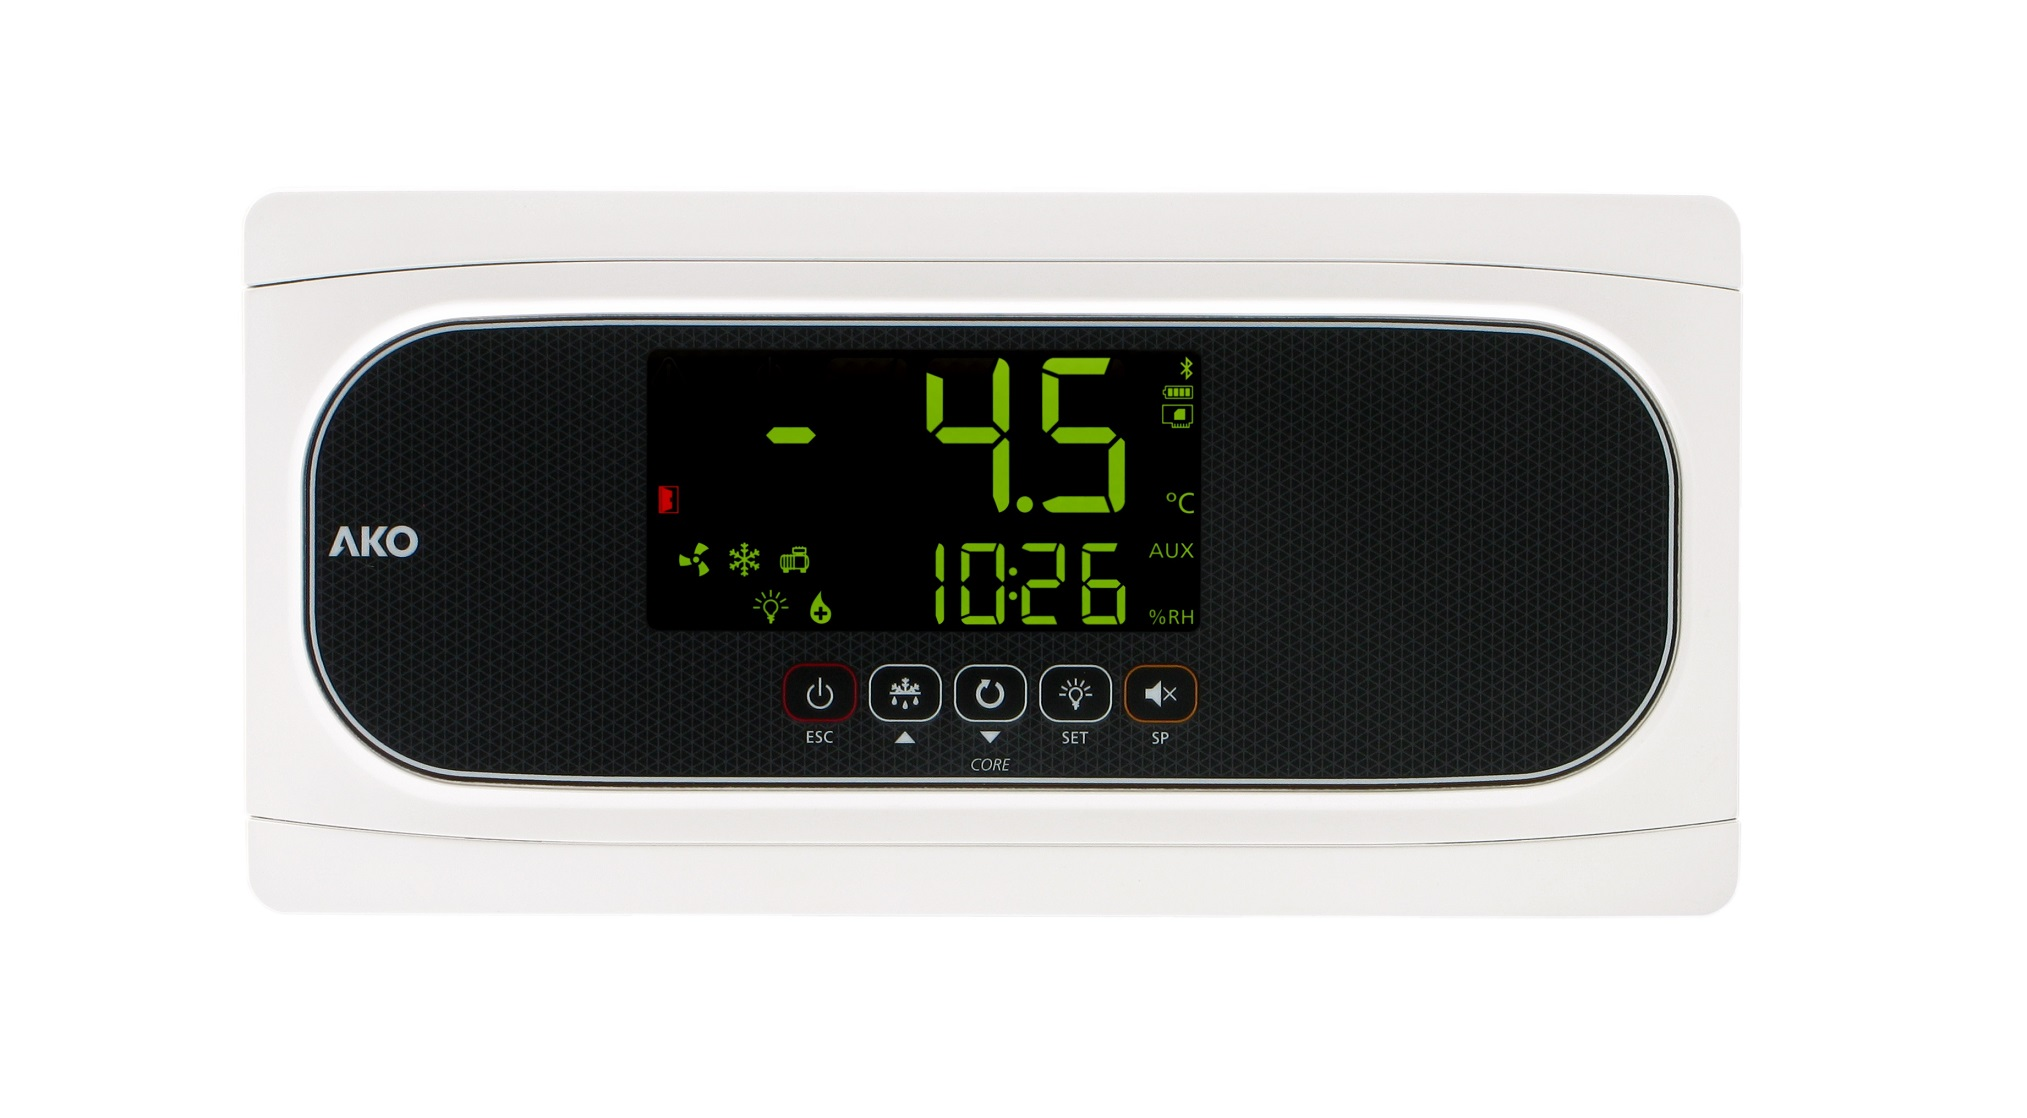 AKOCORE-ako-controlador-temperatura-humedad